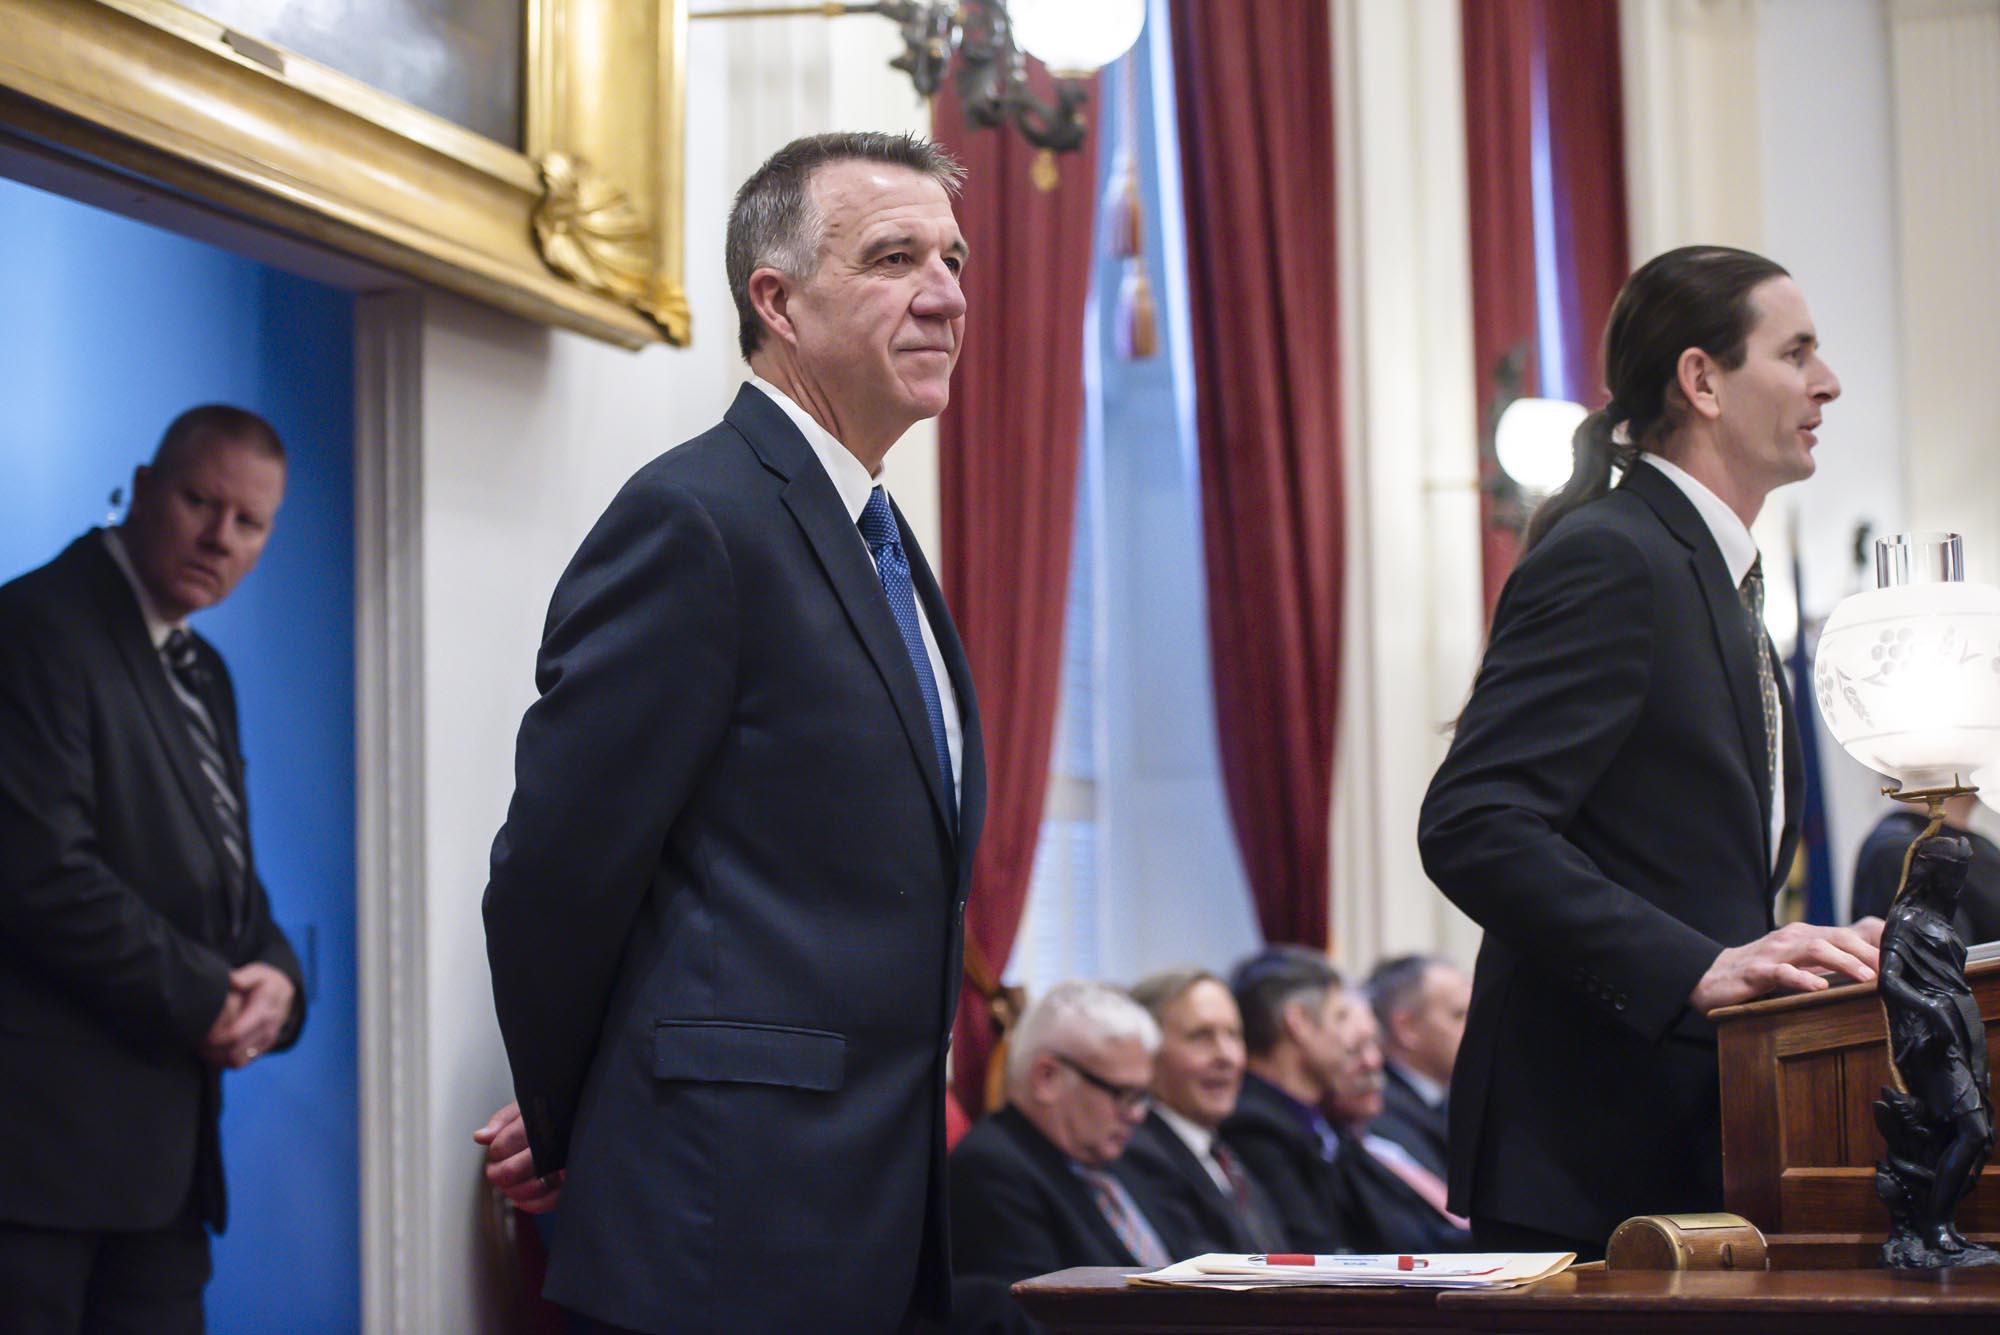 WATCH LIVE: Gov. Phil Scott's 2020 budget address